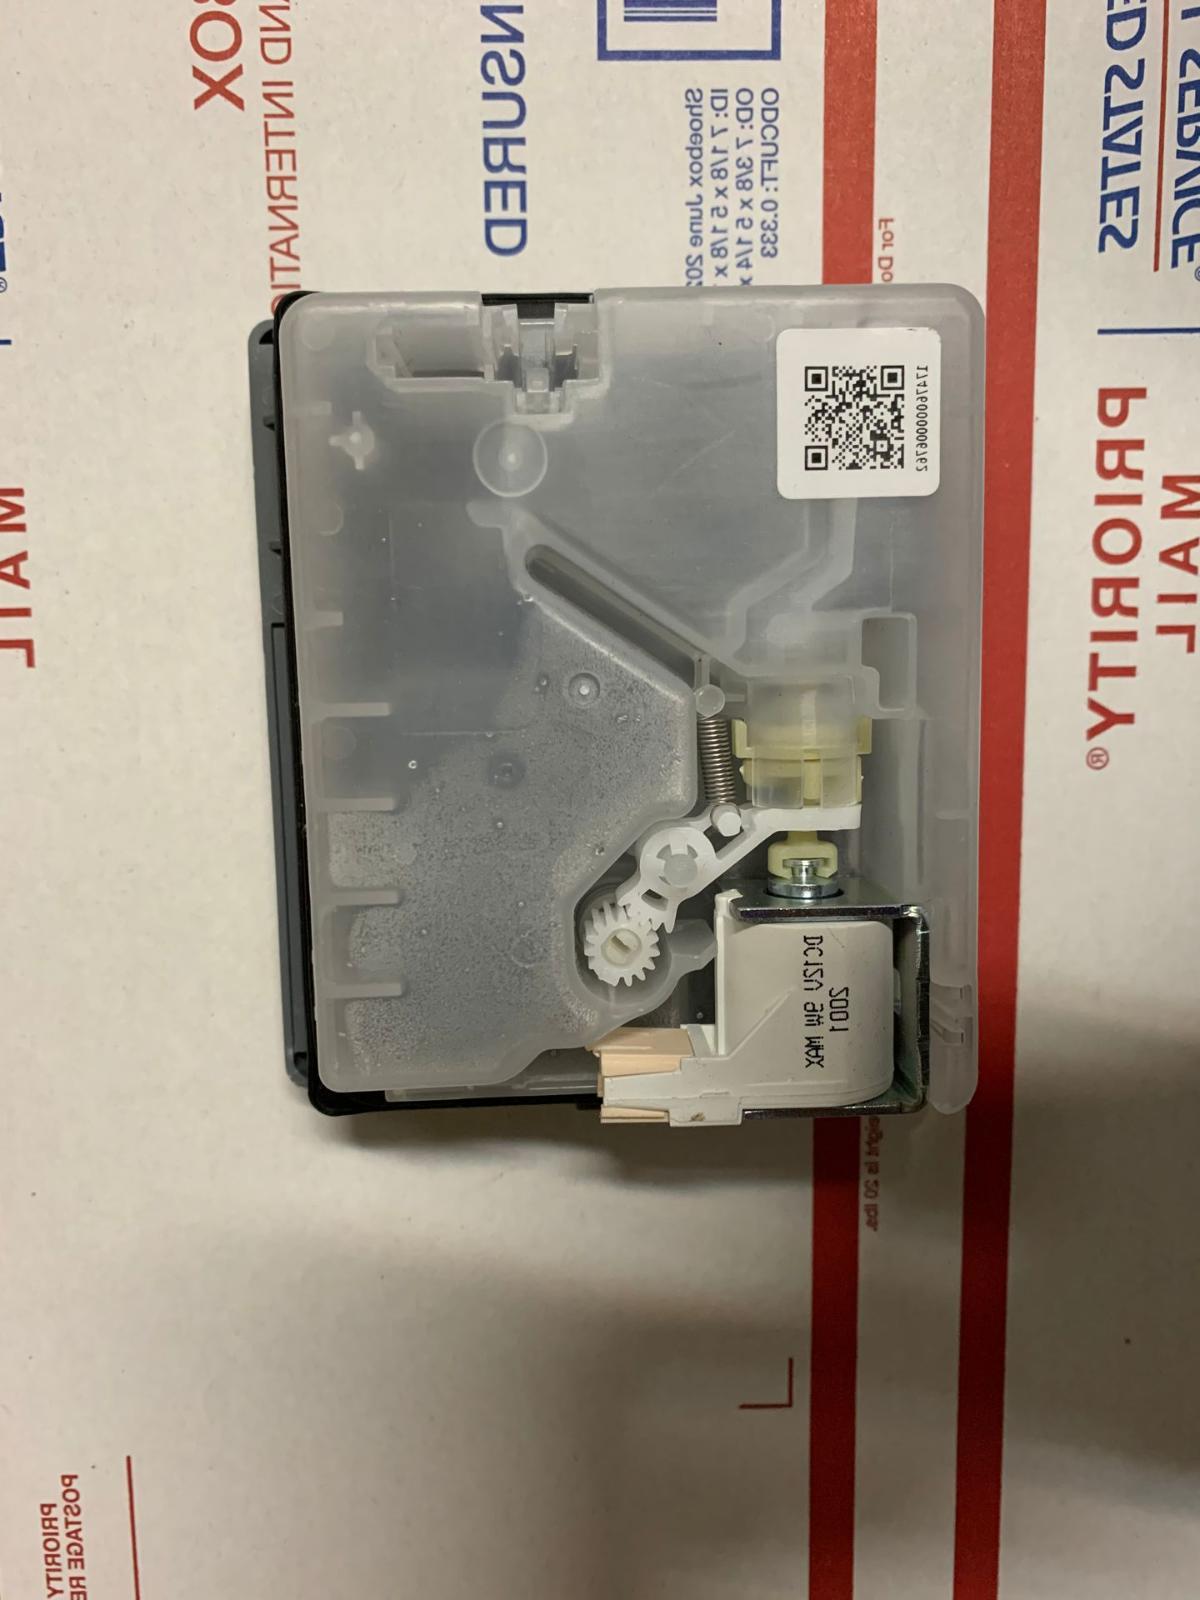 Samsung Dispenser